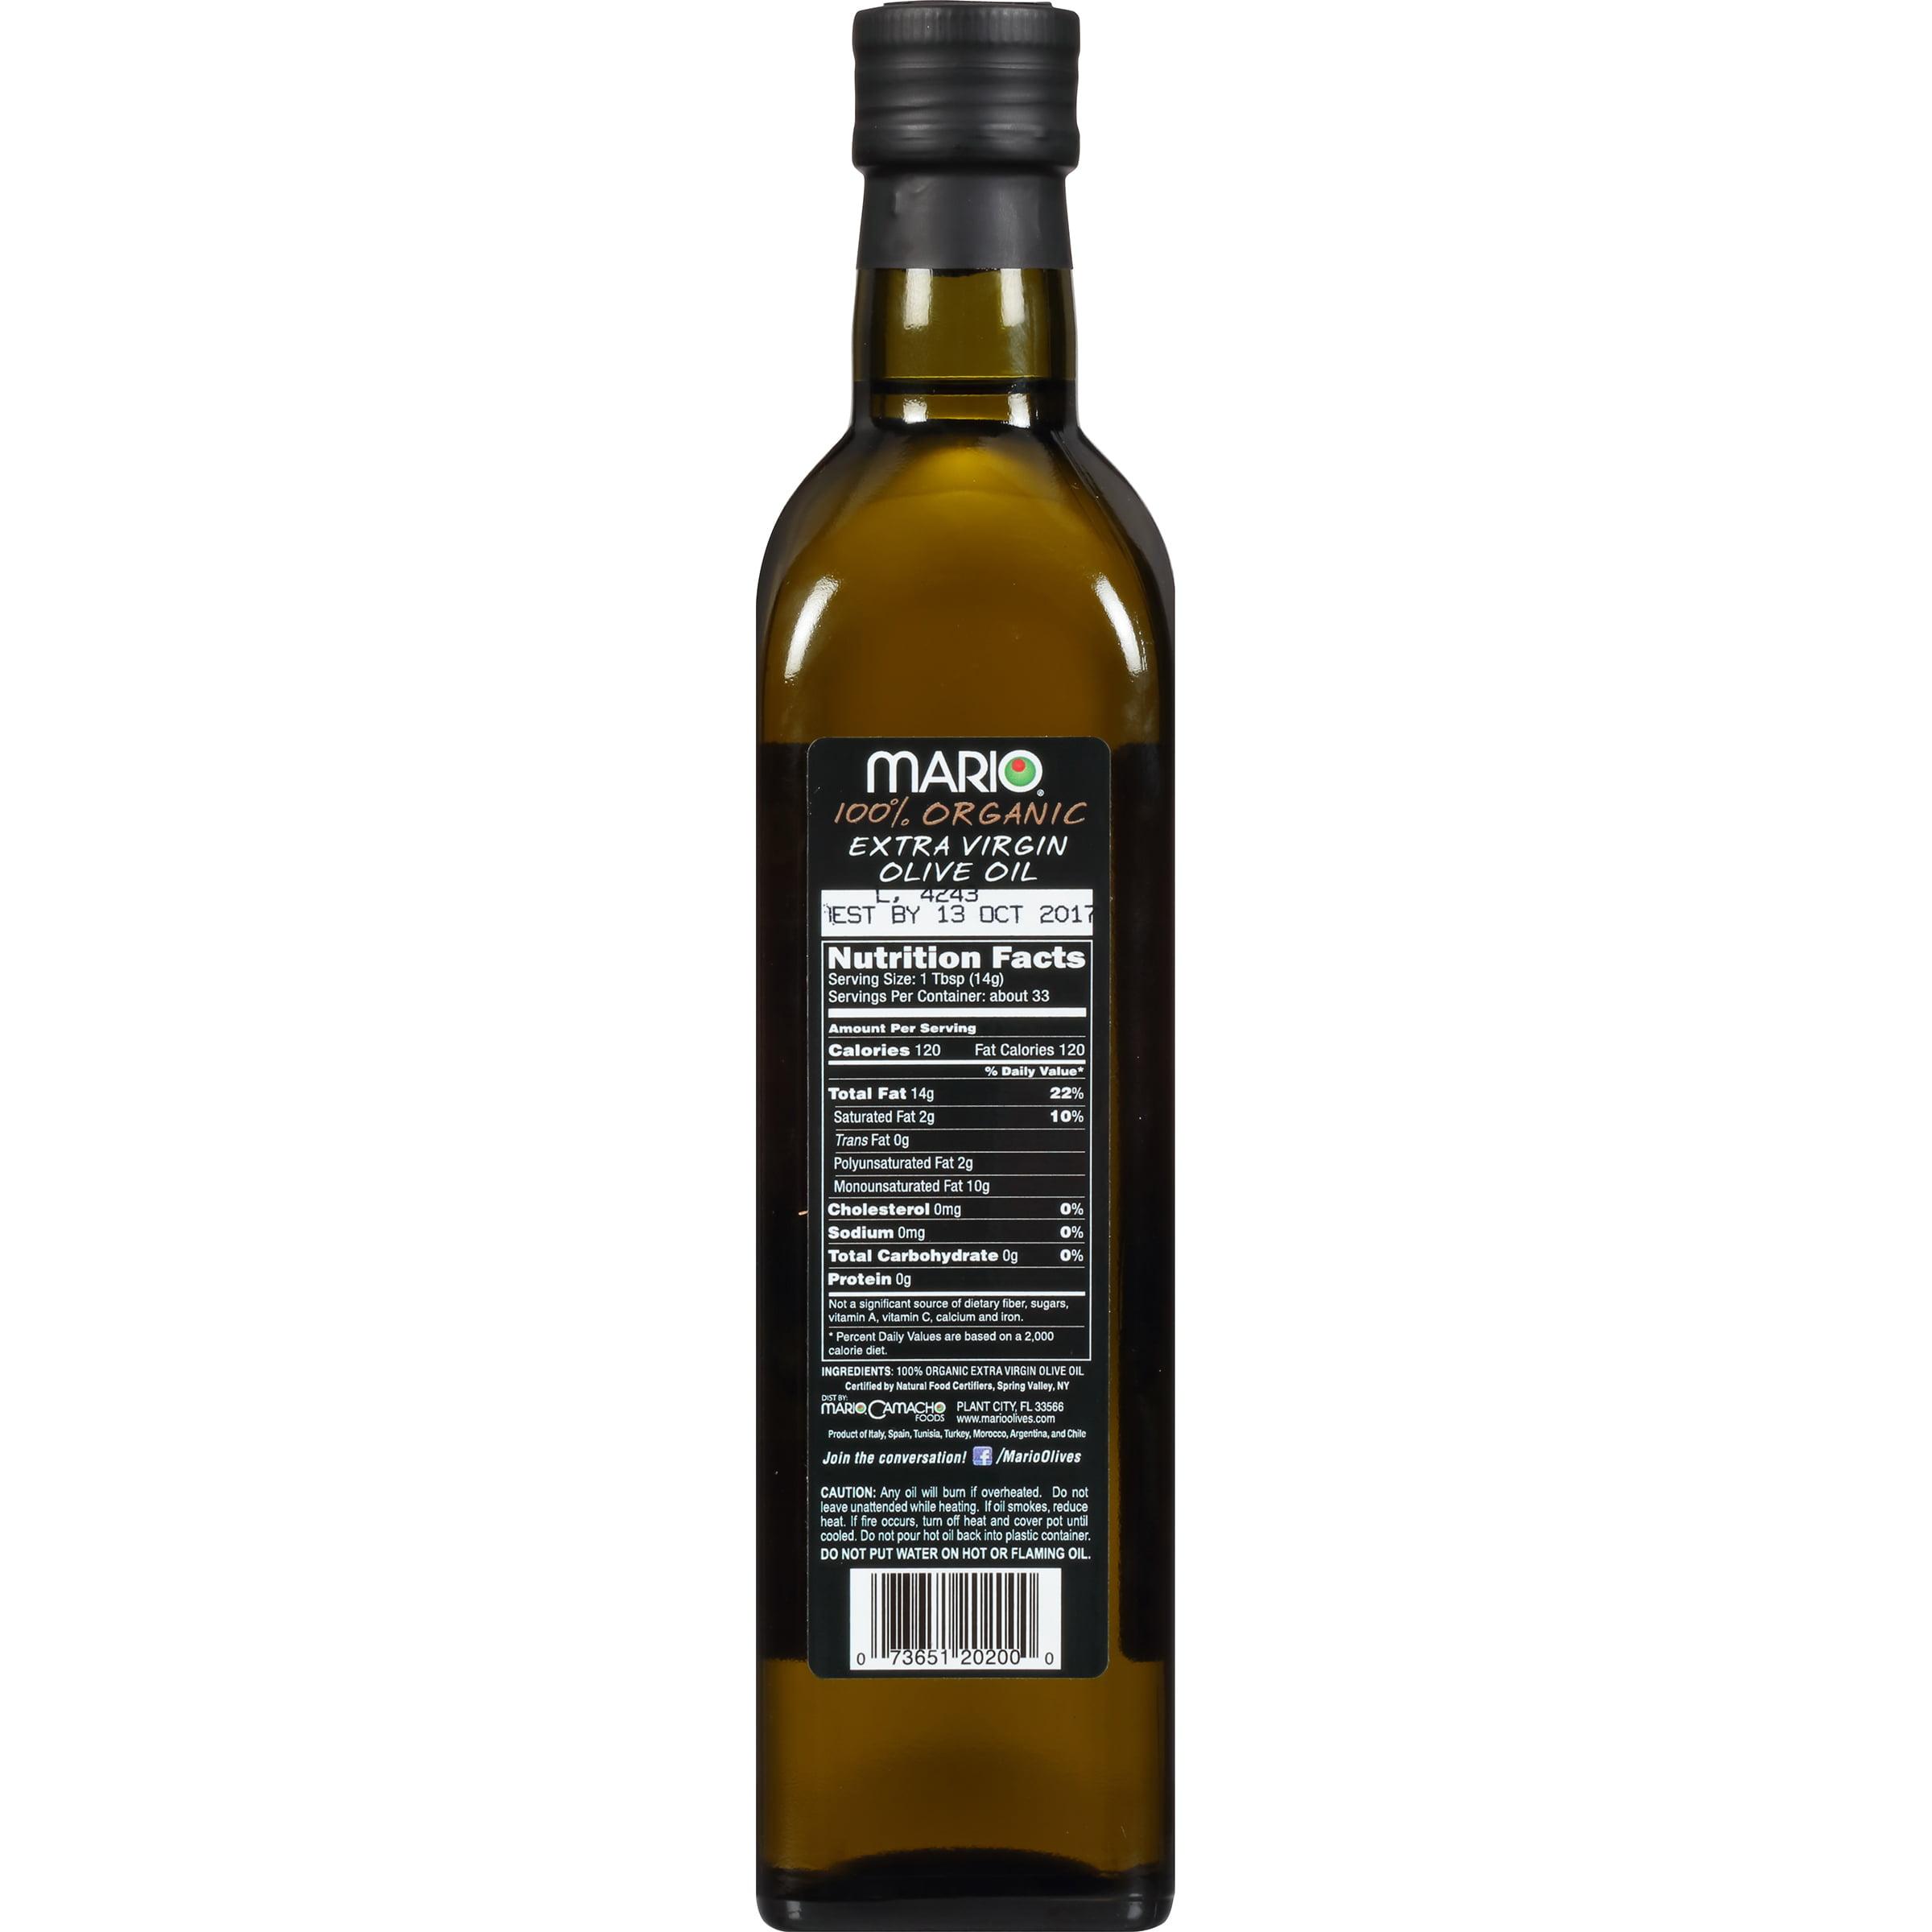 Mario® 100% Organic Extra Virgin Olive Oil 17 fl. oz. Bottle ...